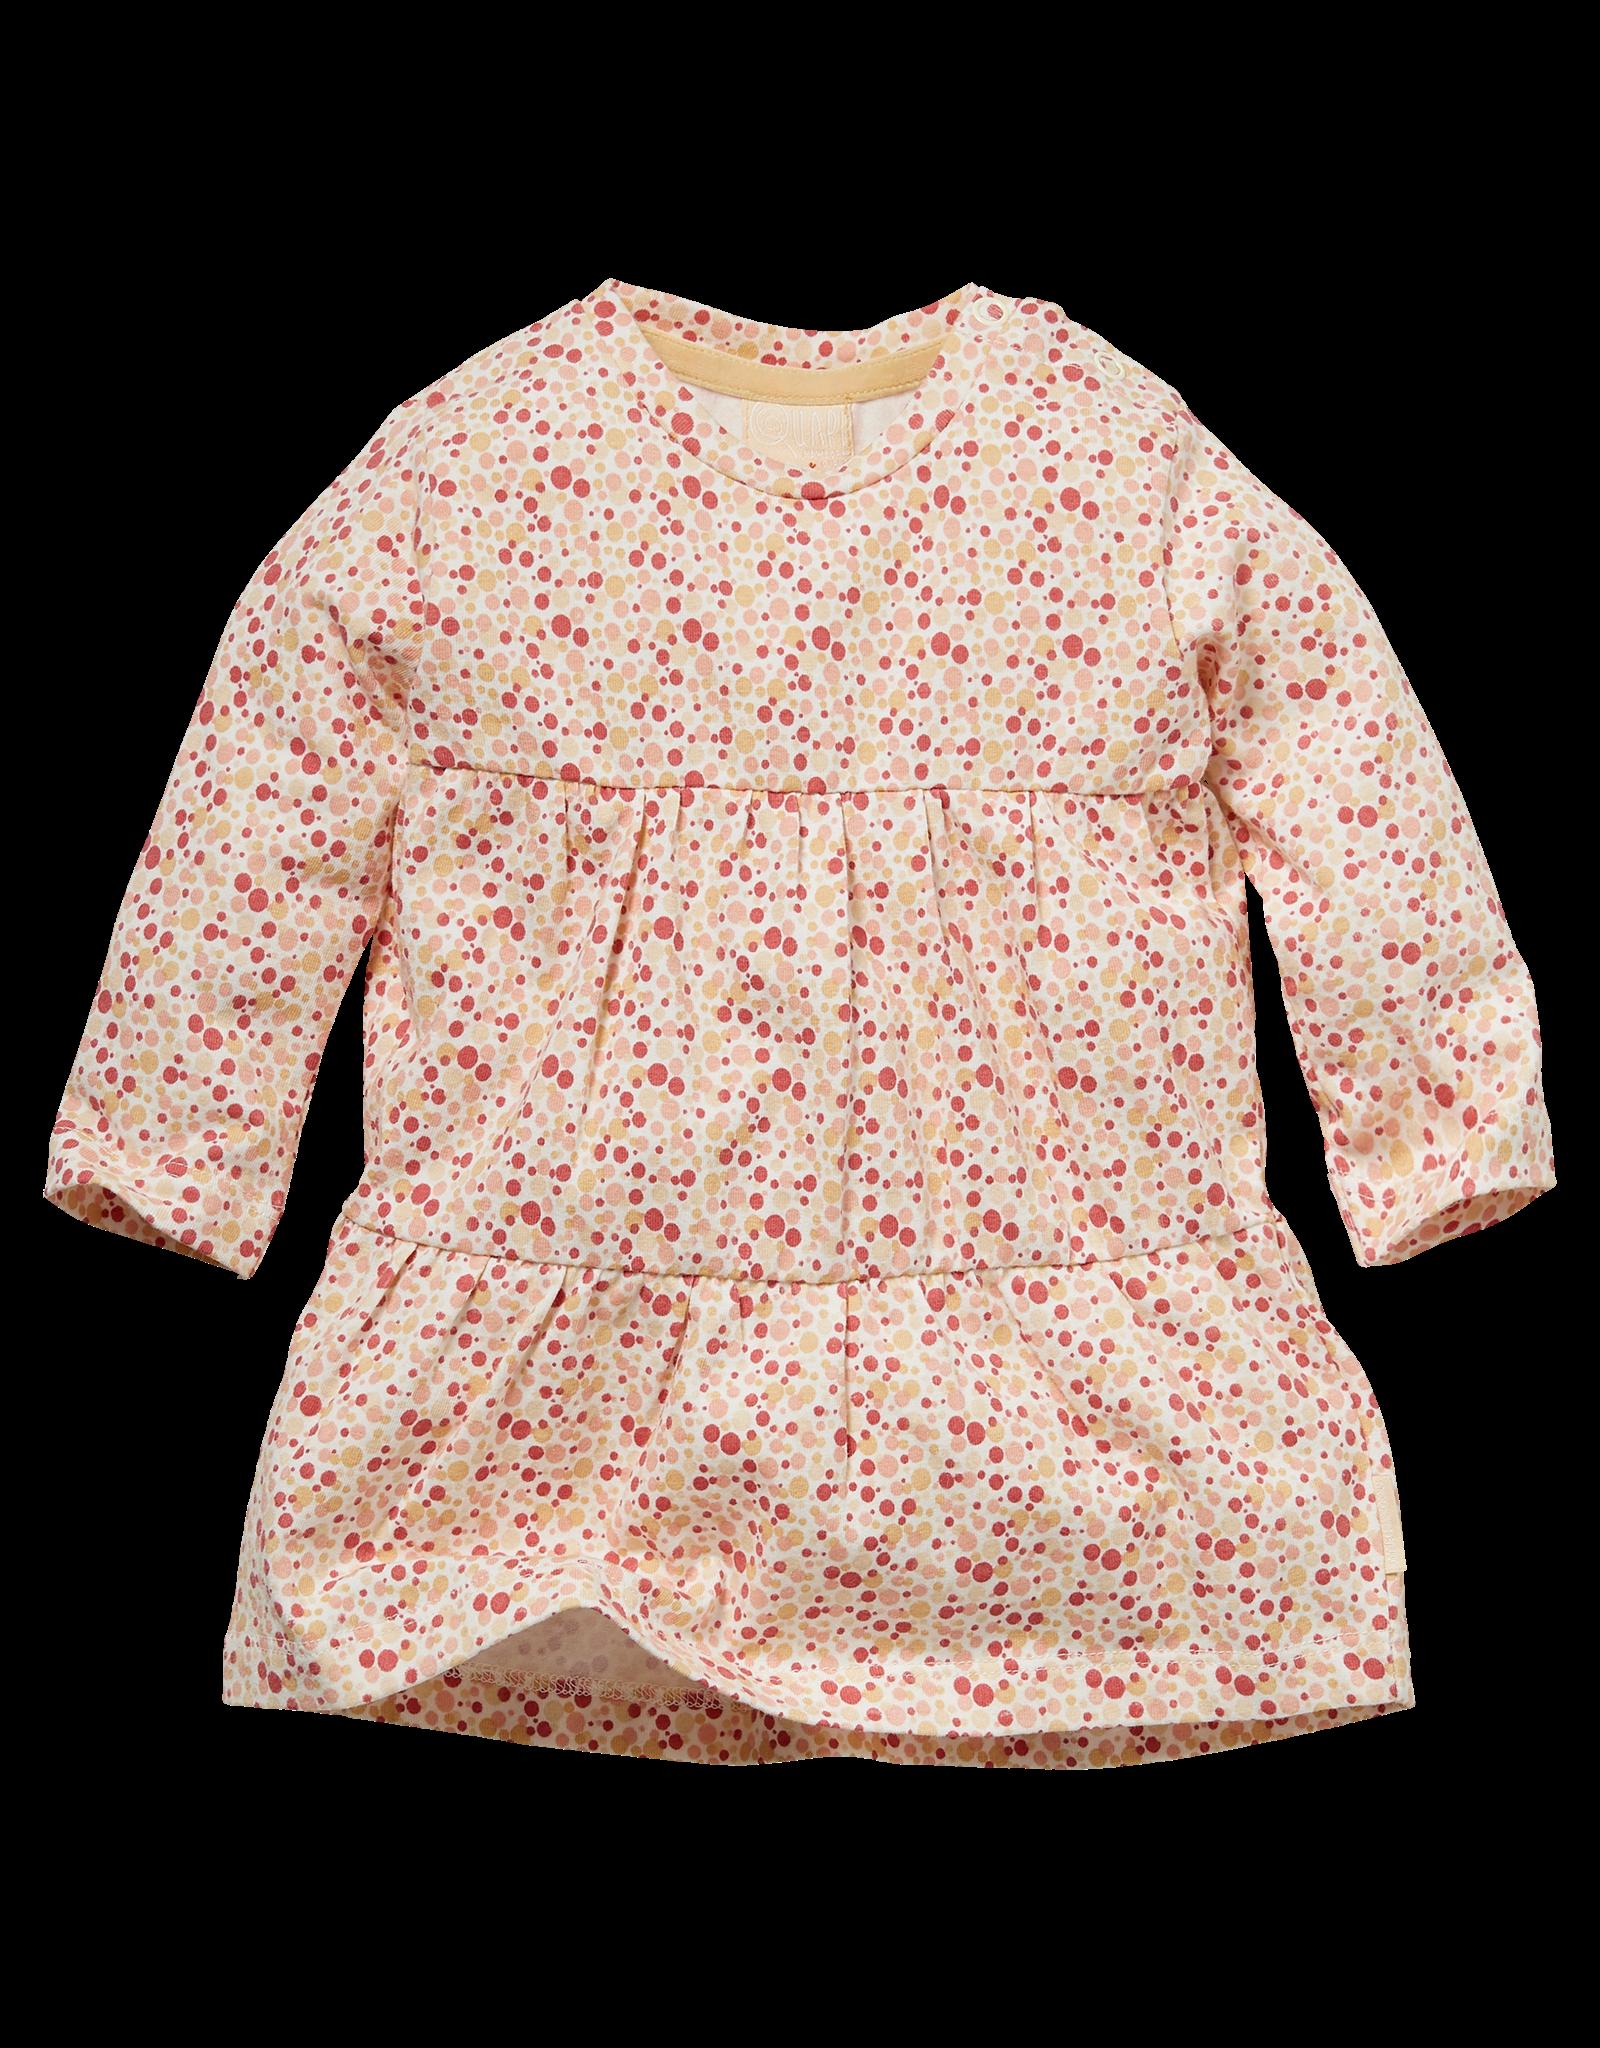 Quapi DRESS, NADIA , Multicolor Dot